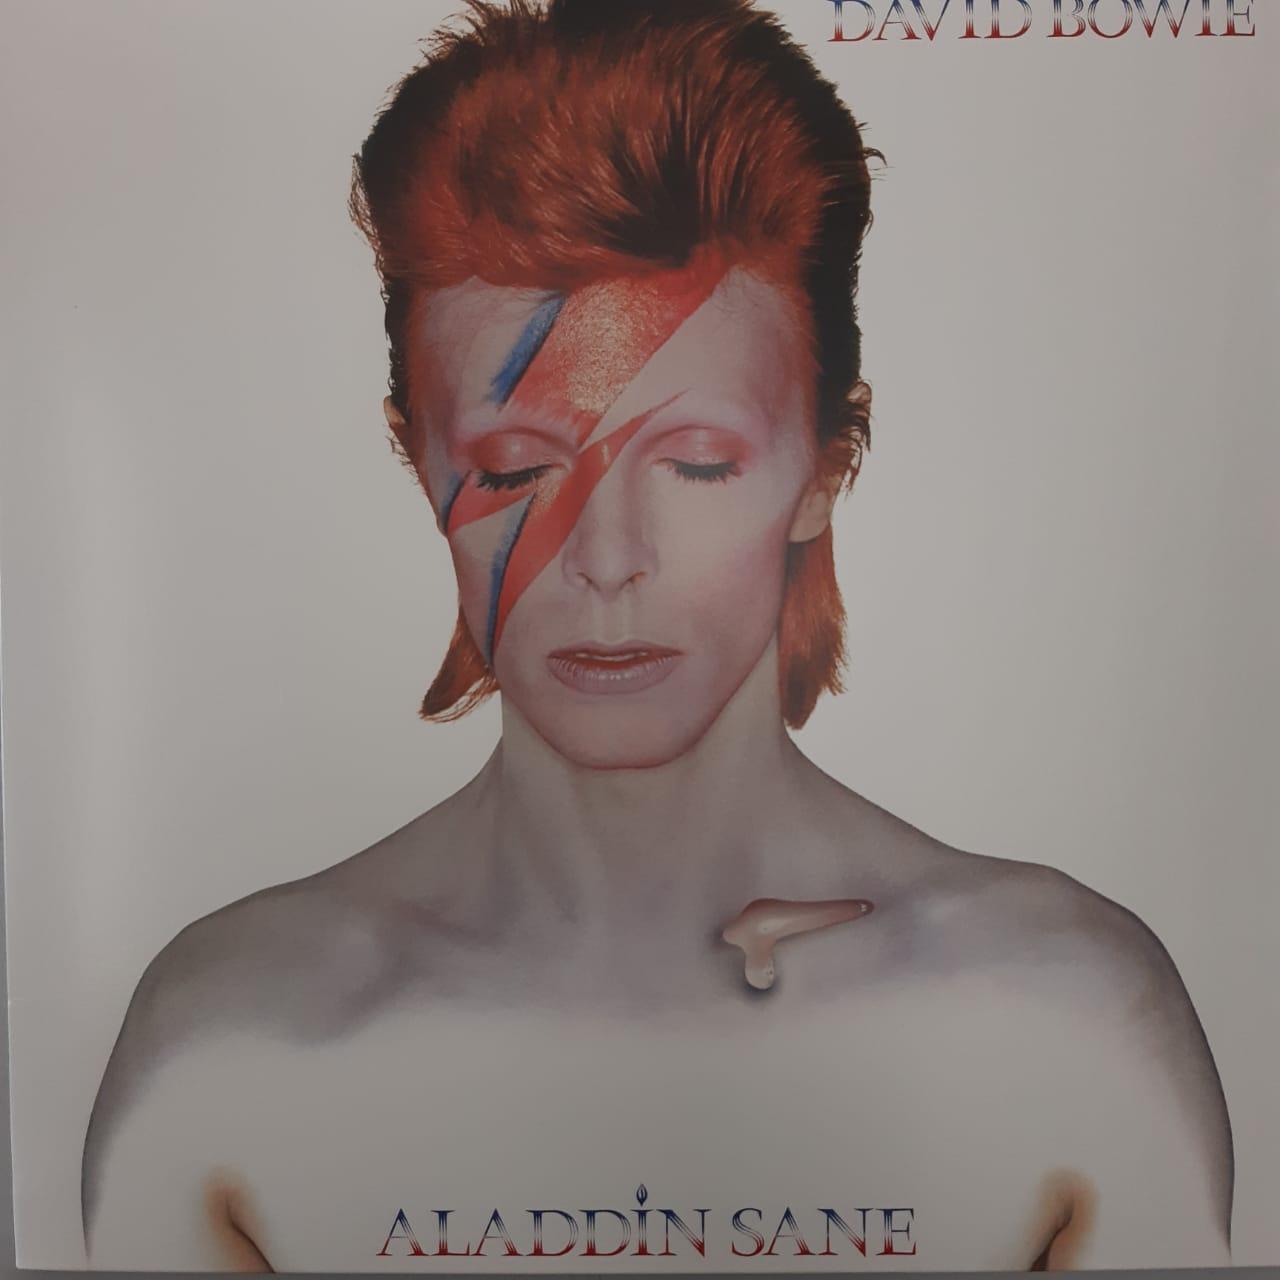 Lp Vinil David Bowie Aladdin Sane